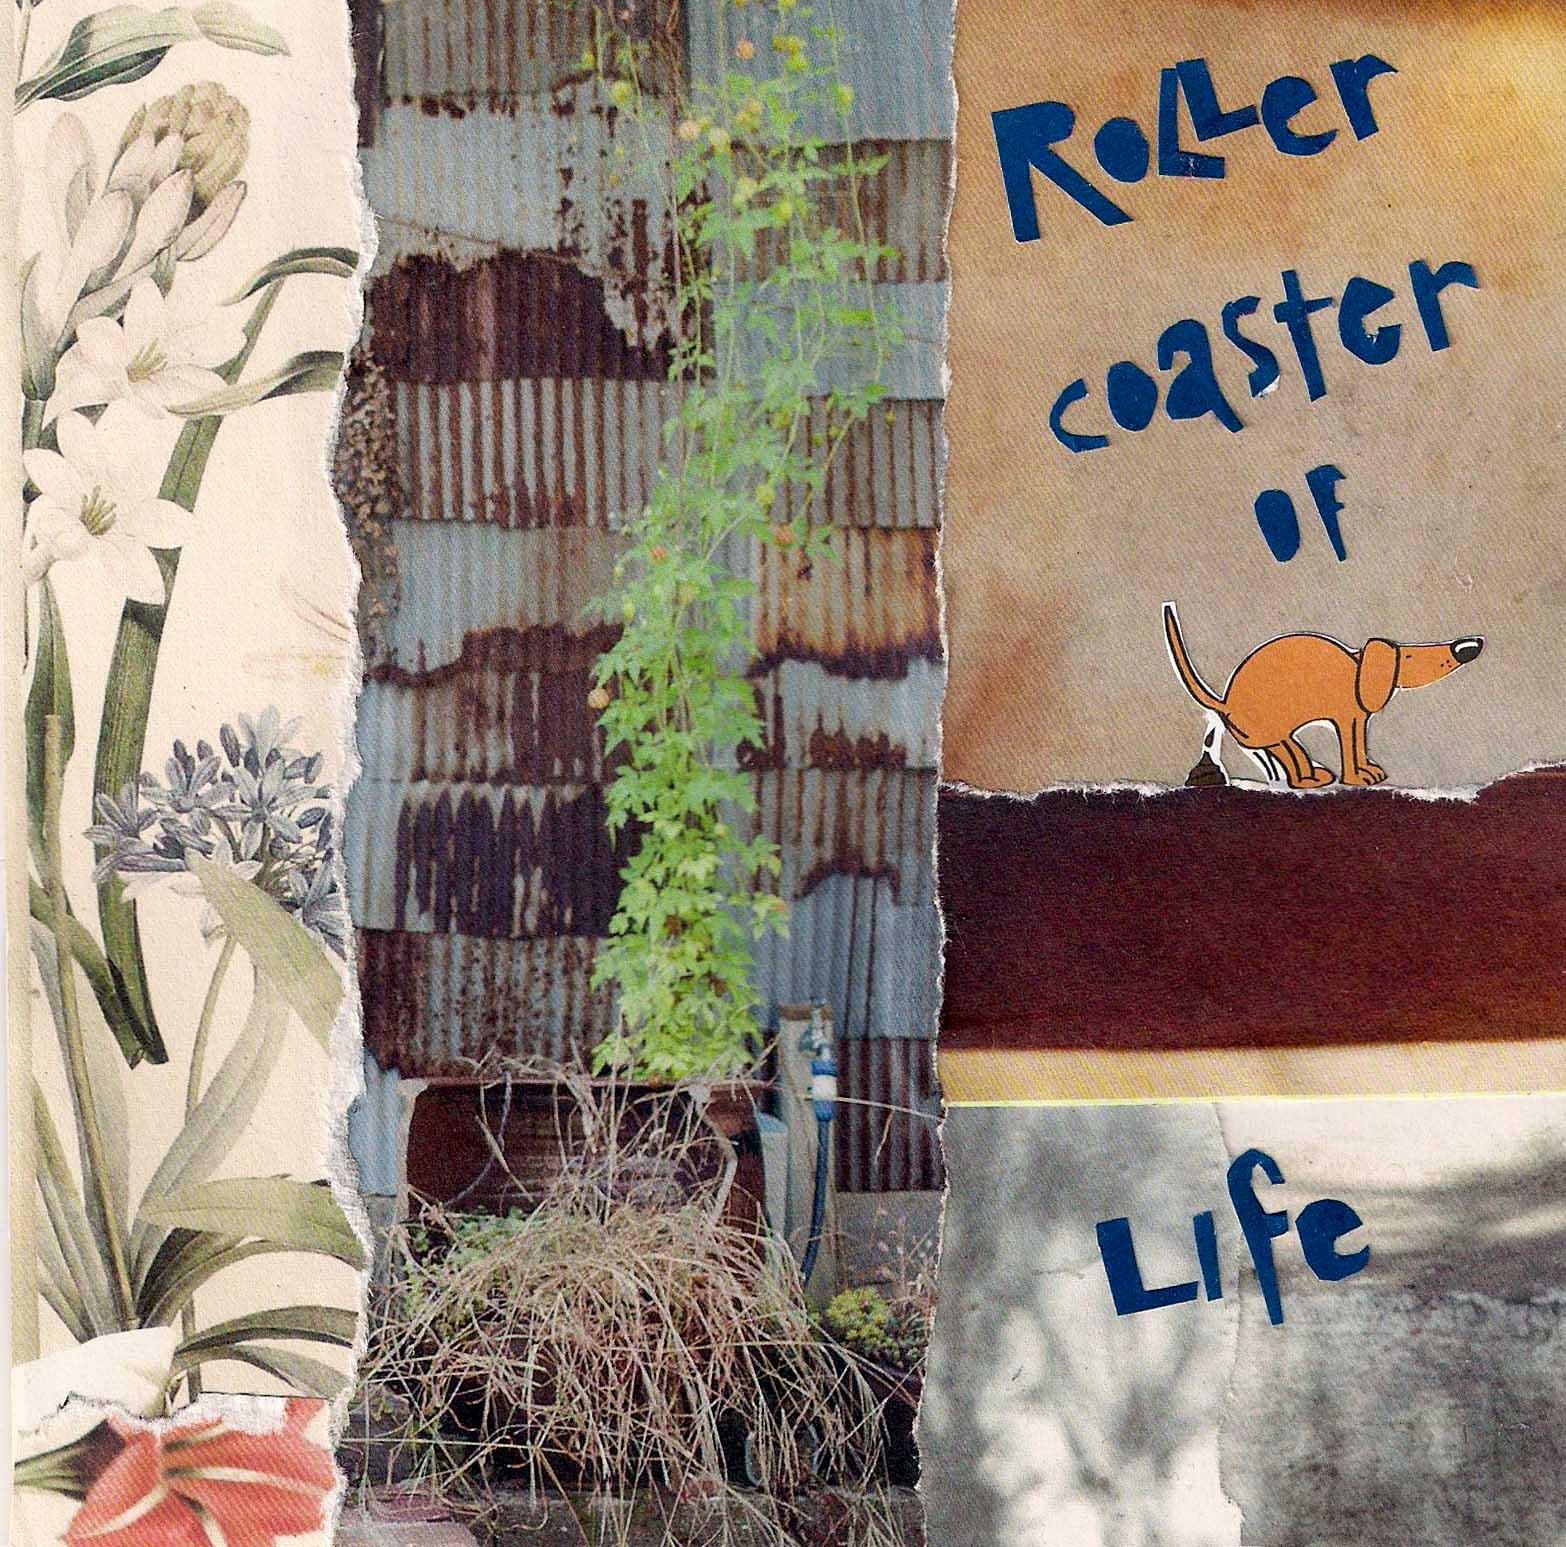 Mixtape November 2016 Rollercoaster of life Metterschling 2016